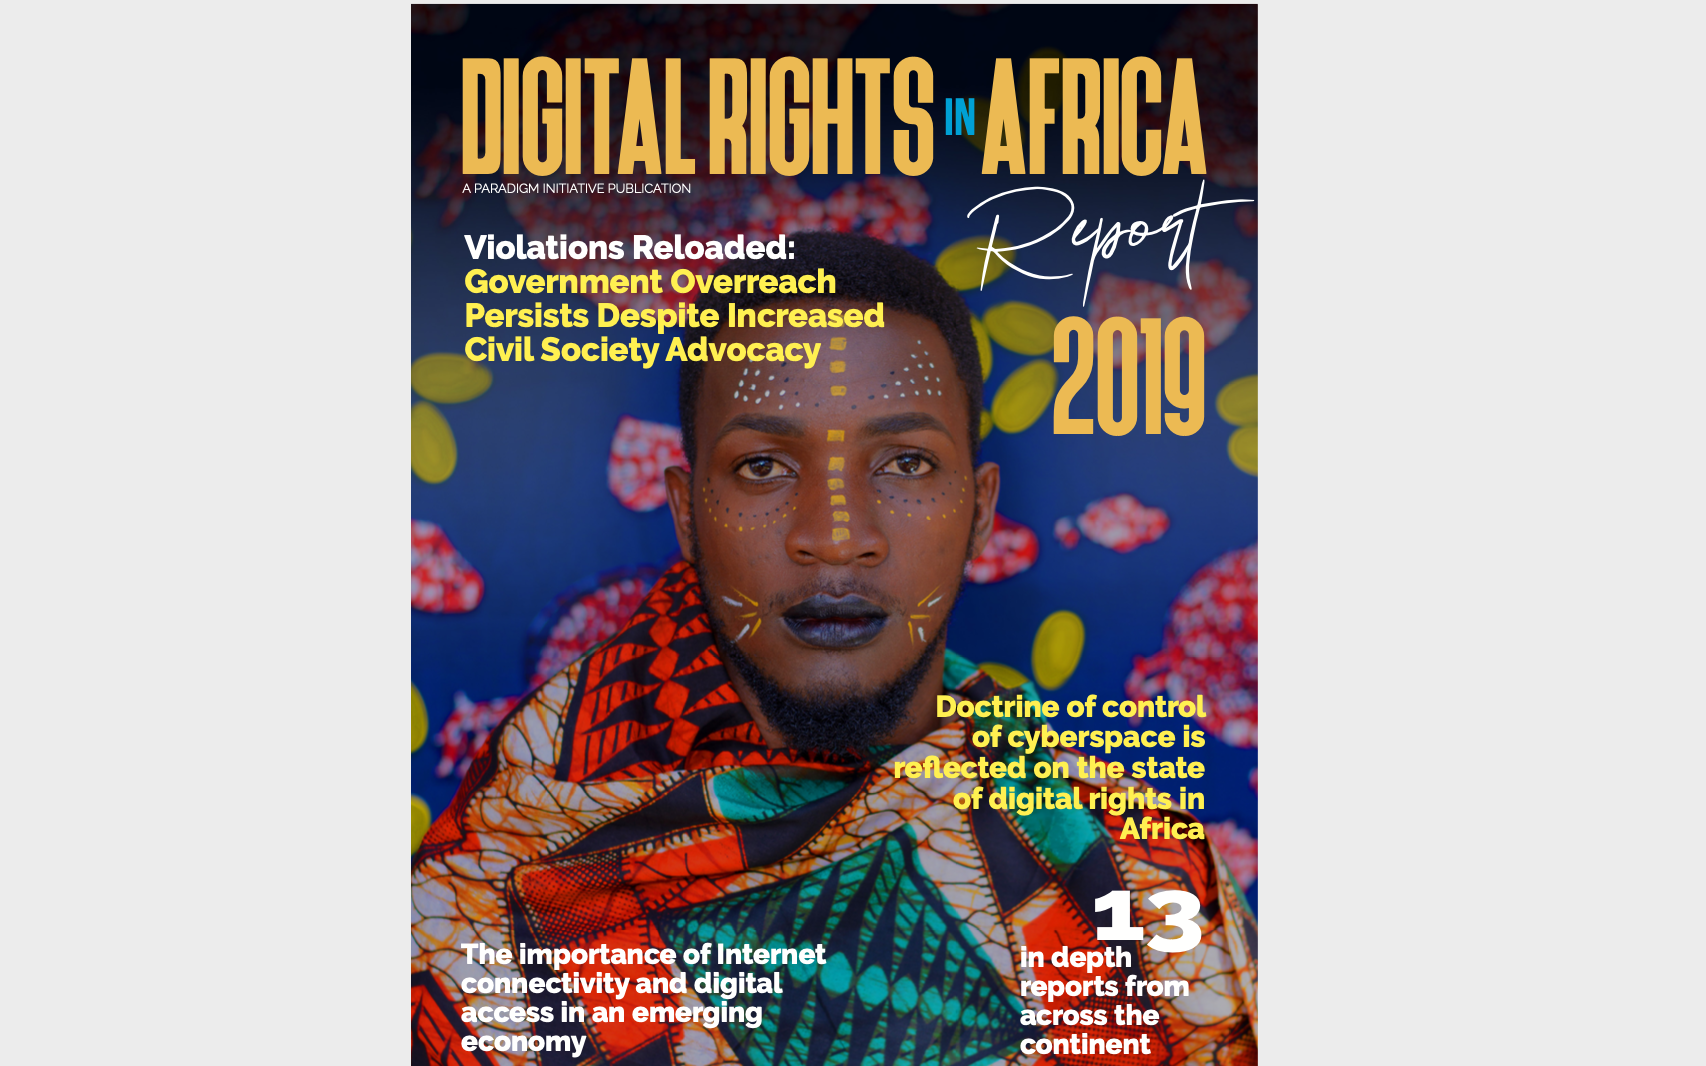 Paradigm Initiative Releases Digital Rights in Africa Report 2019